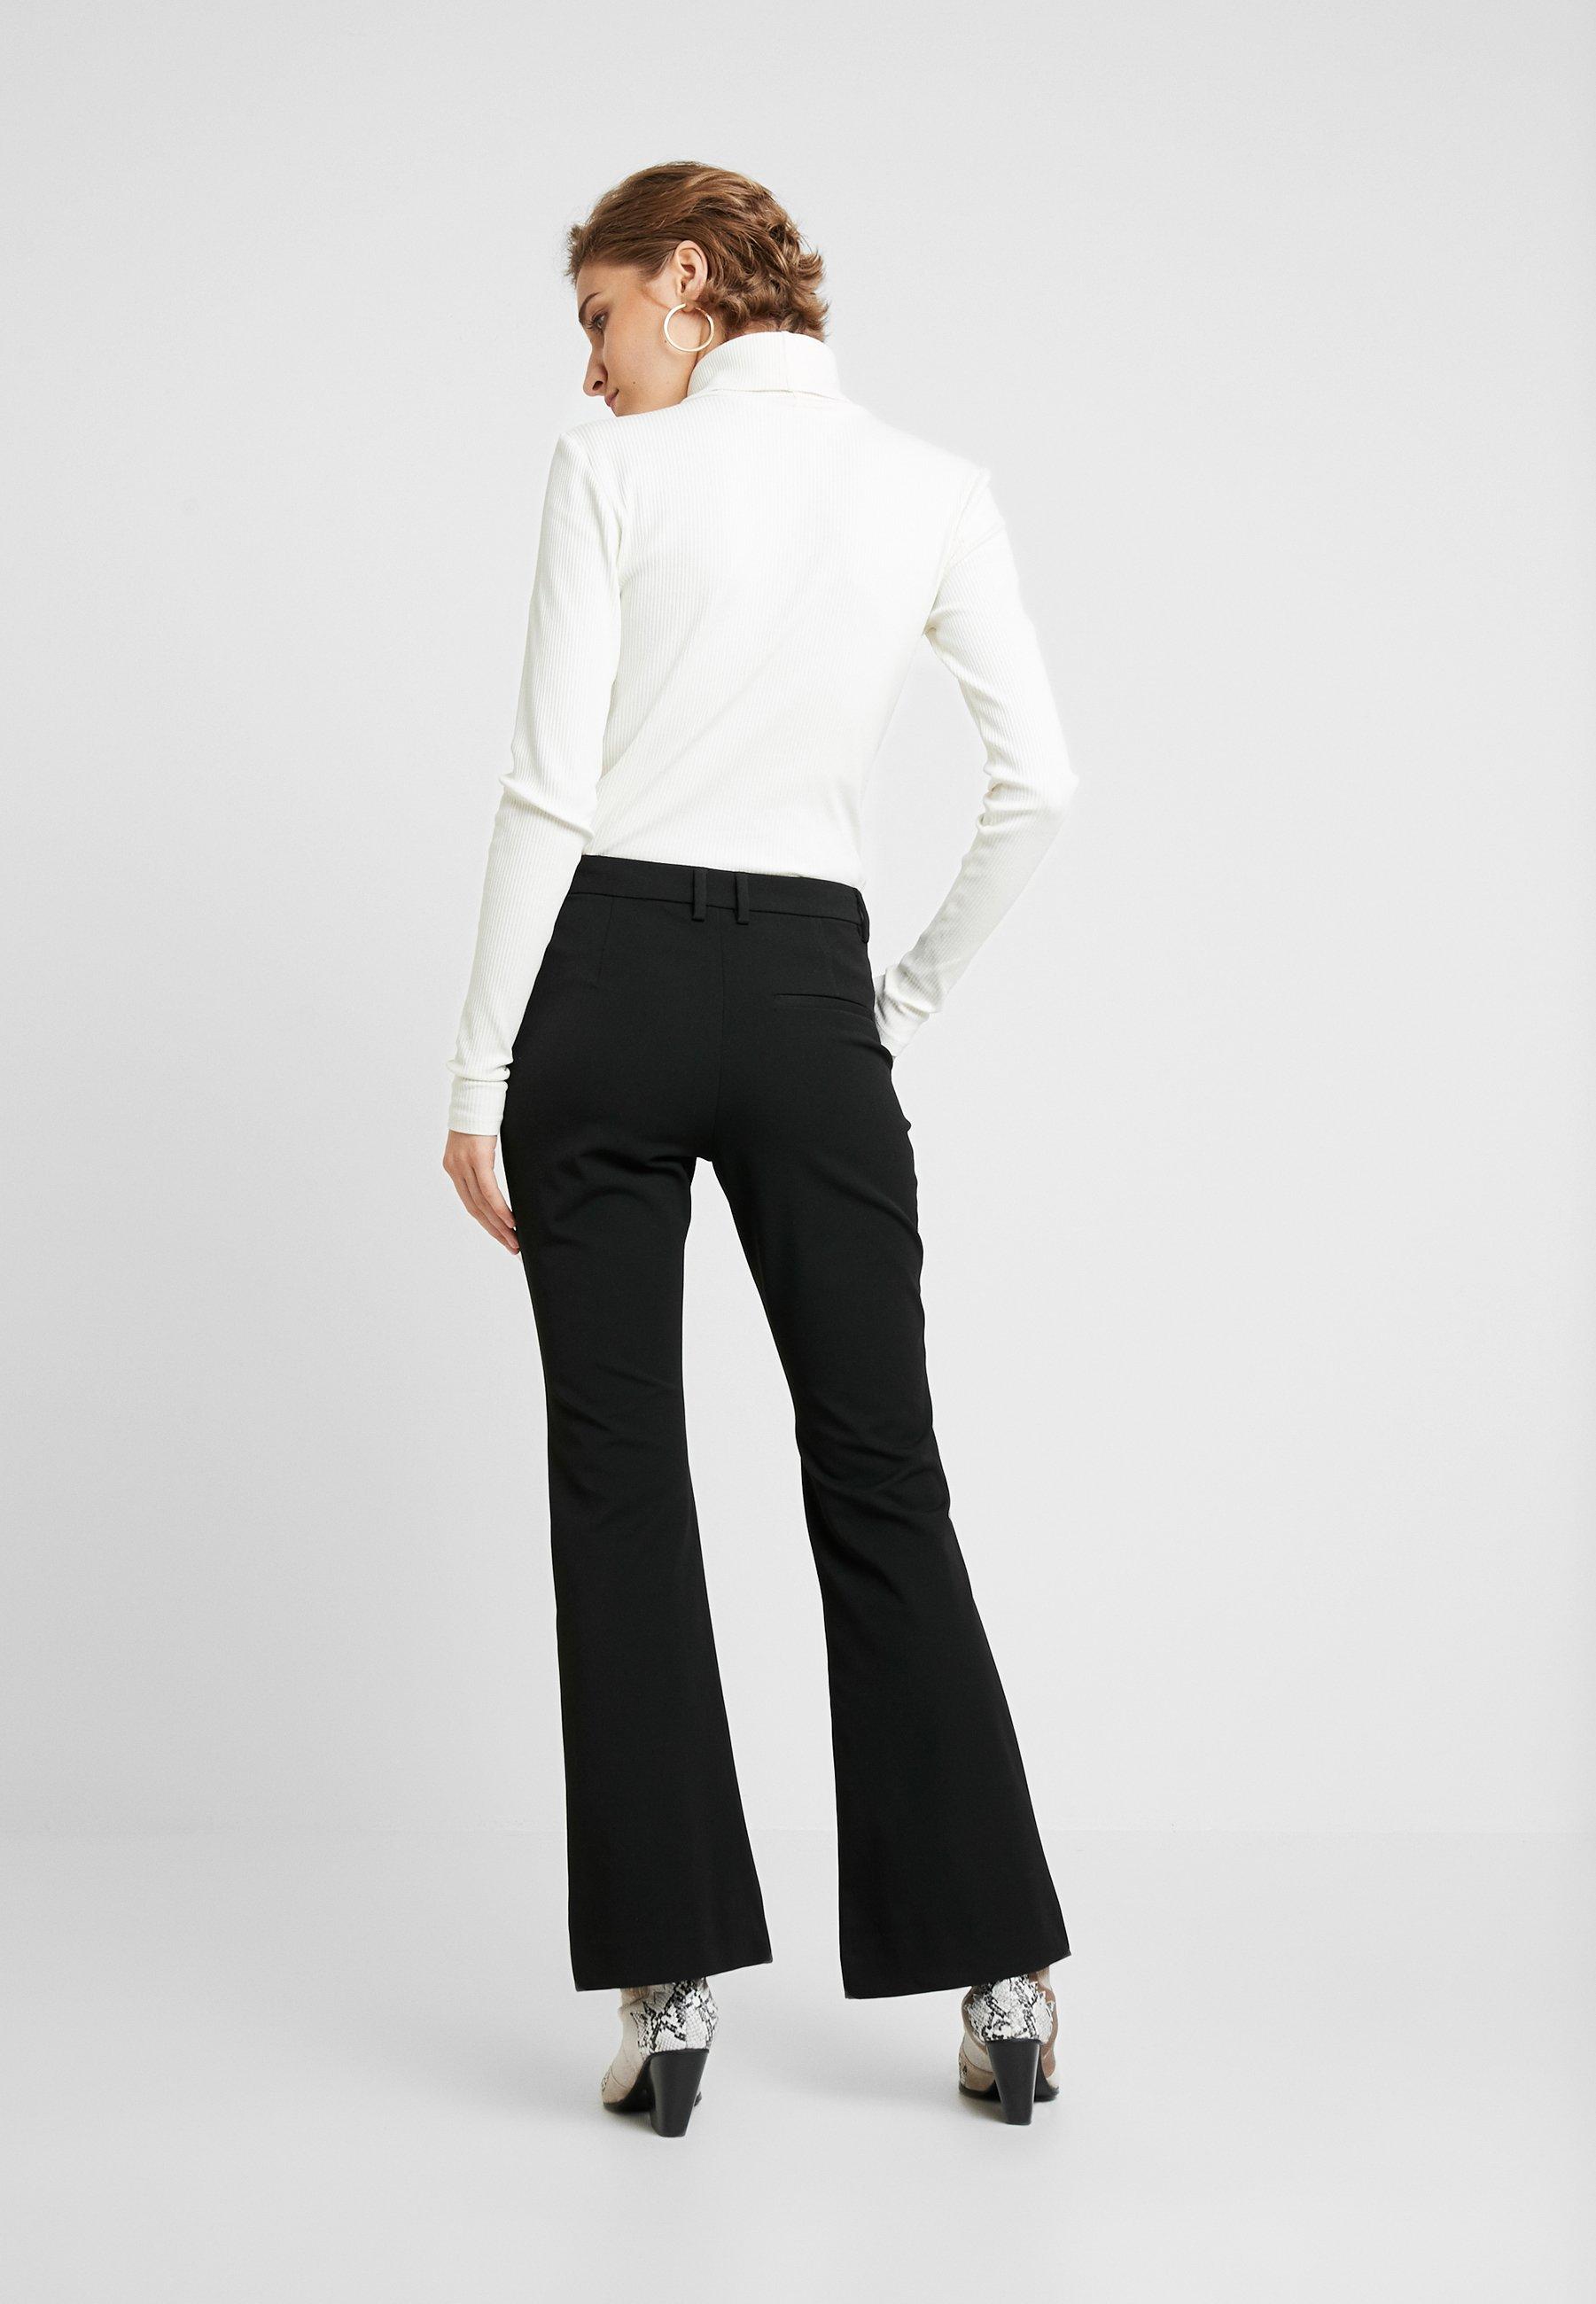 Top-Rated Women's Clothing Gestuz ESMA PANTS Trousers black SrPxb01kh